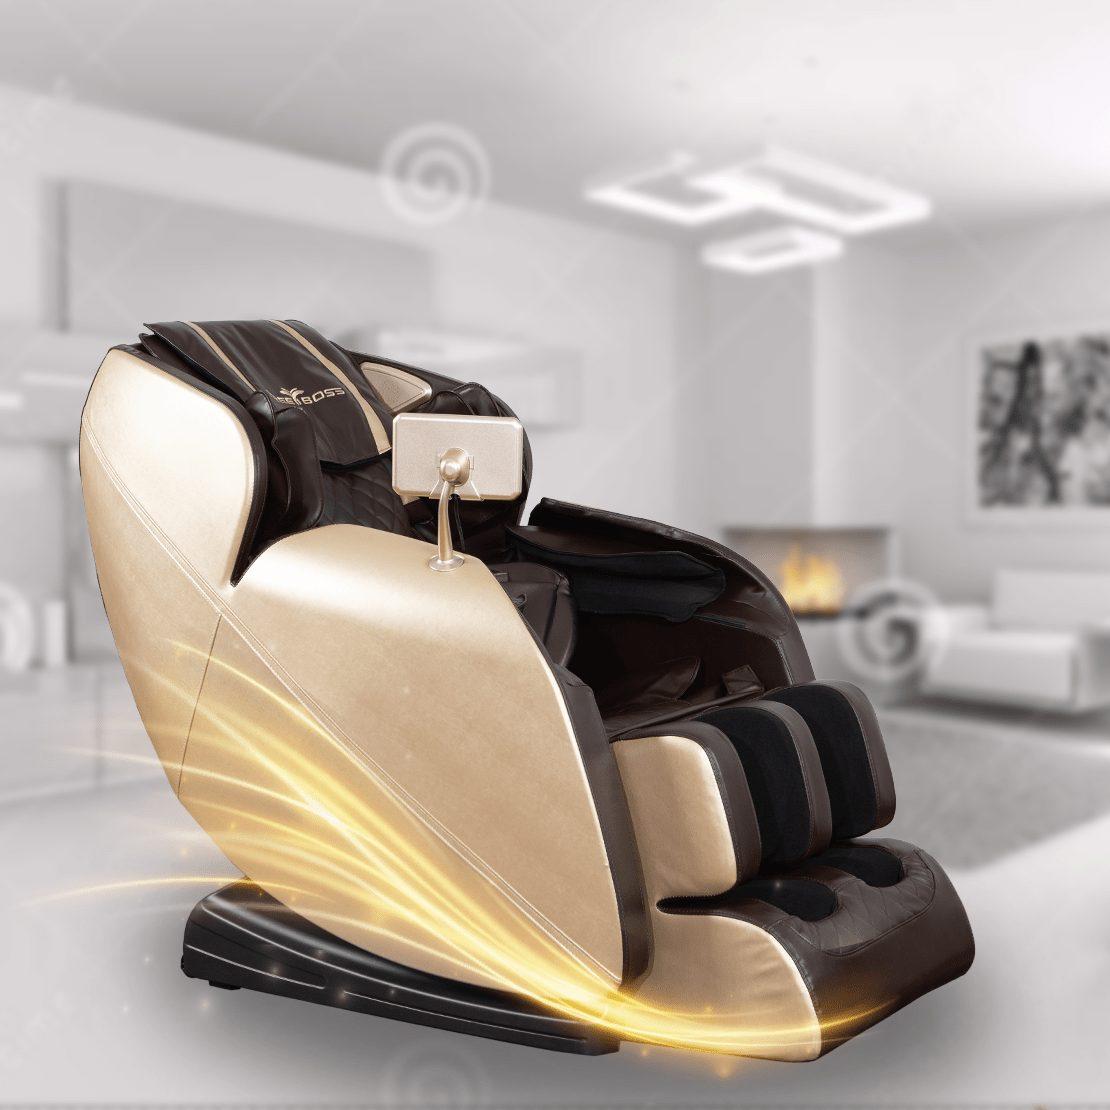 bán ghế massage tphcm